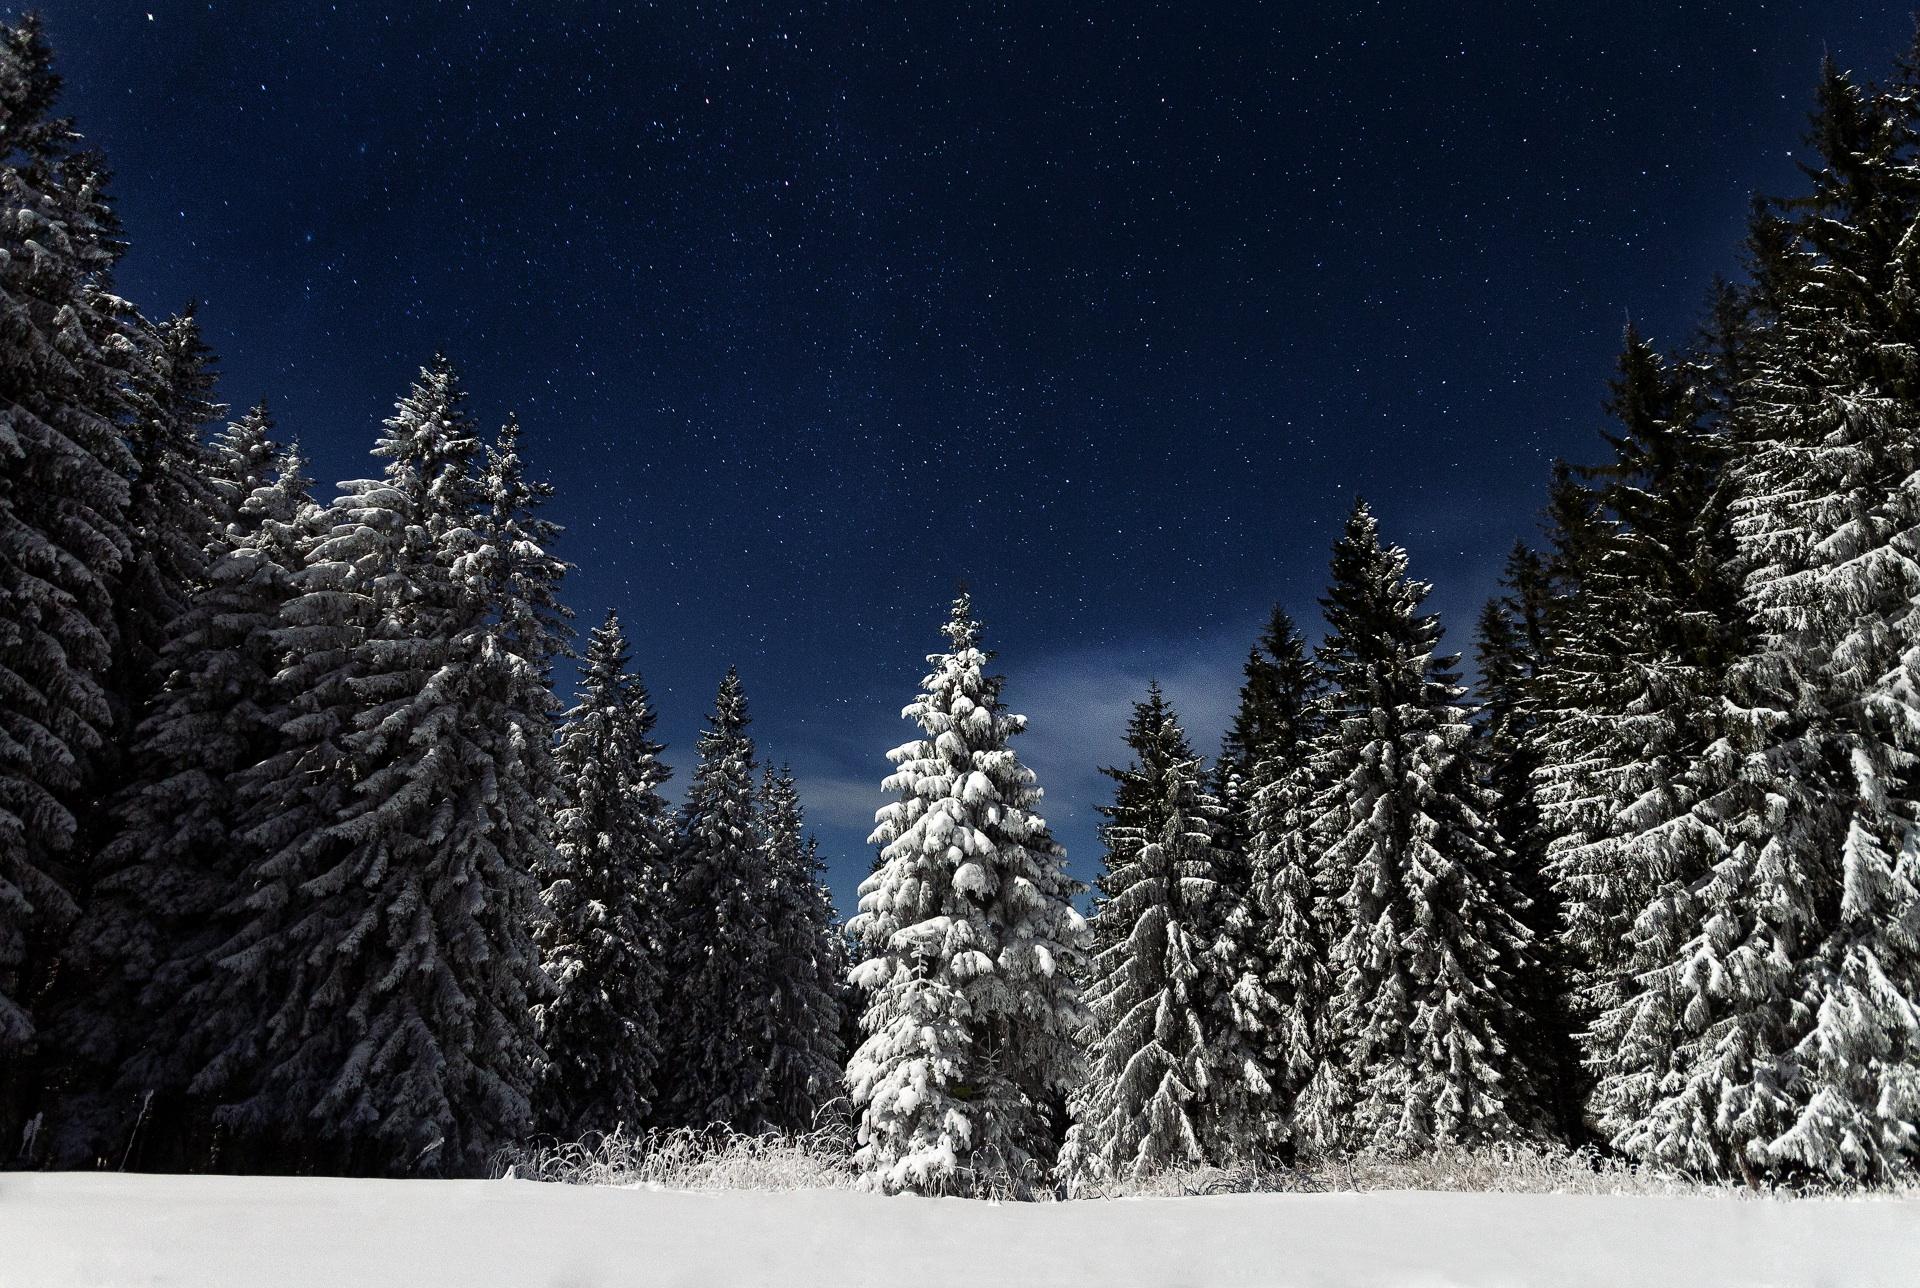 tree-forest-mountain-snow-winter-sky-24266-pxhere.com.jpg